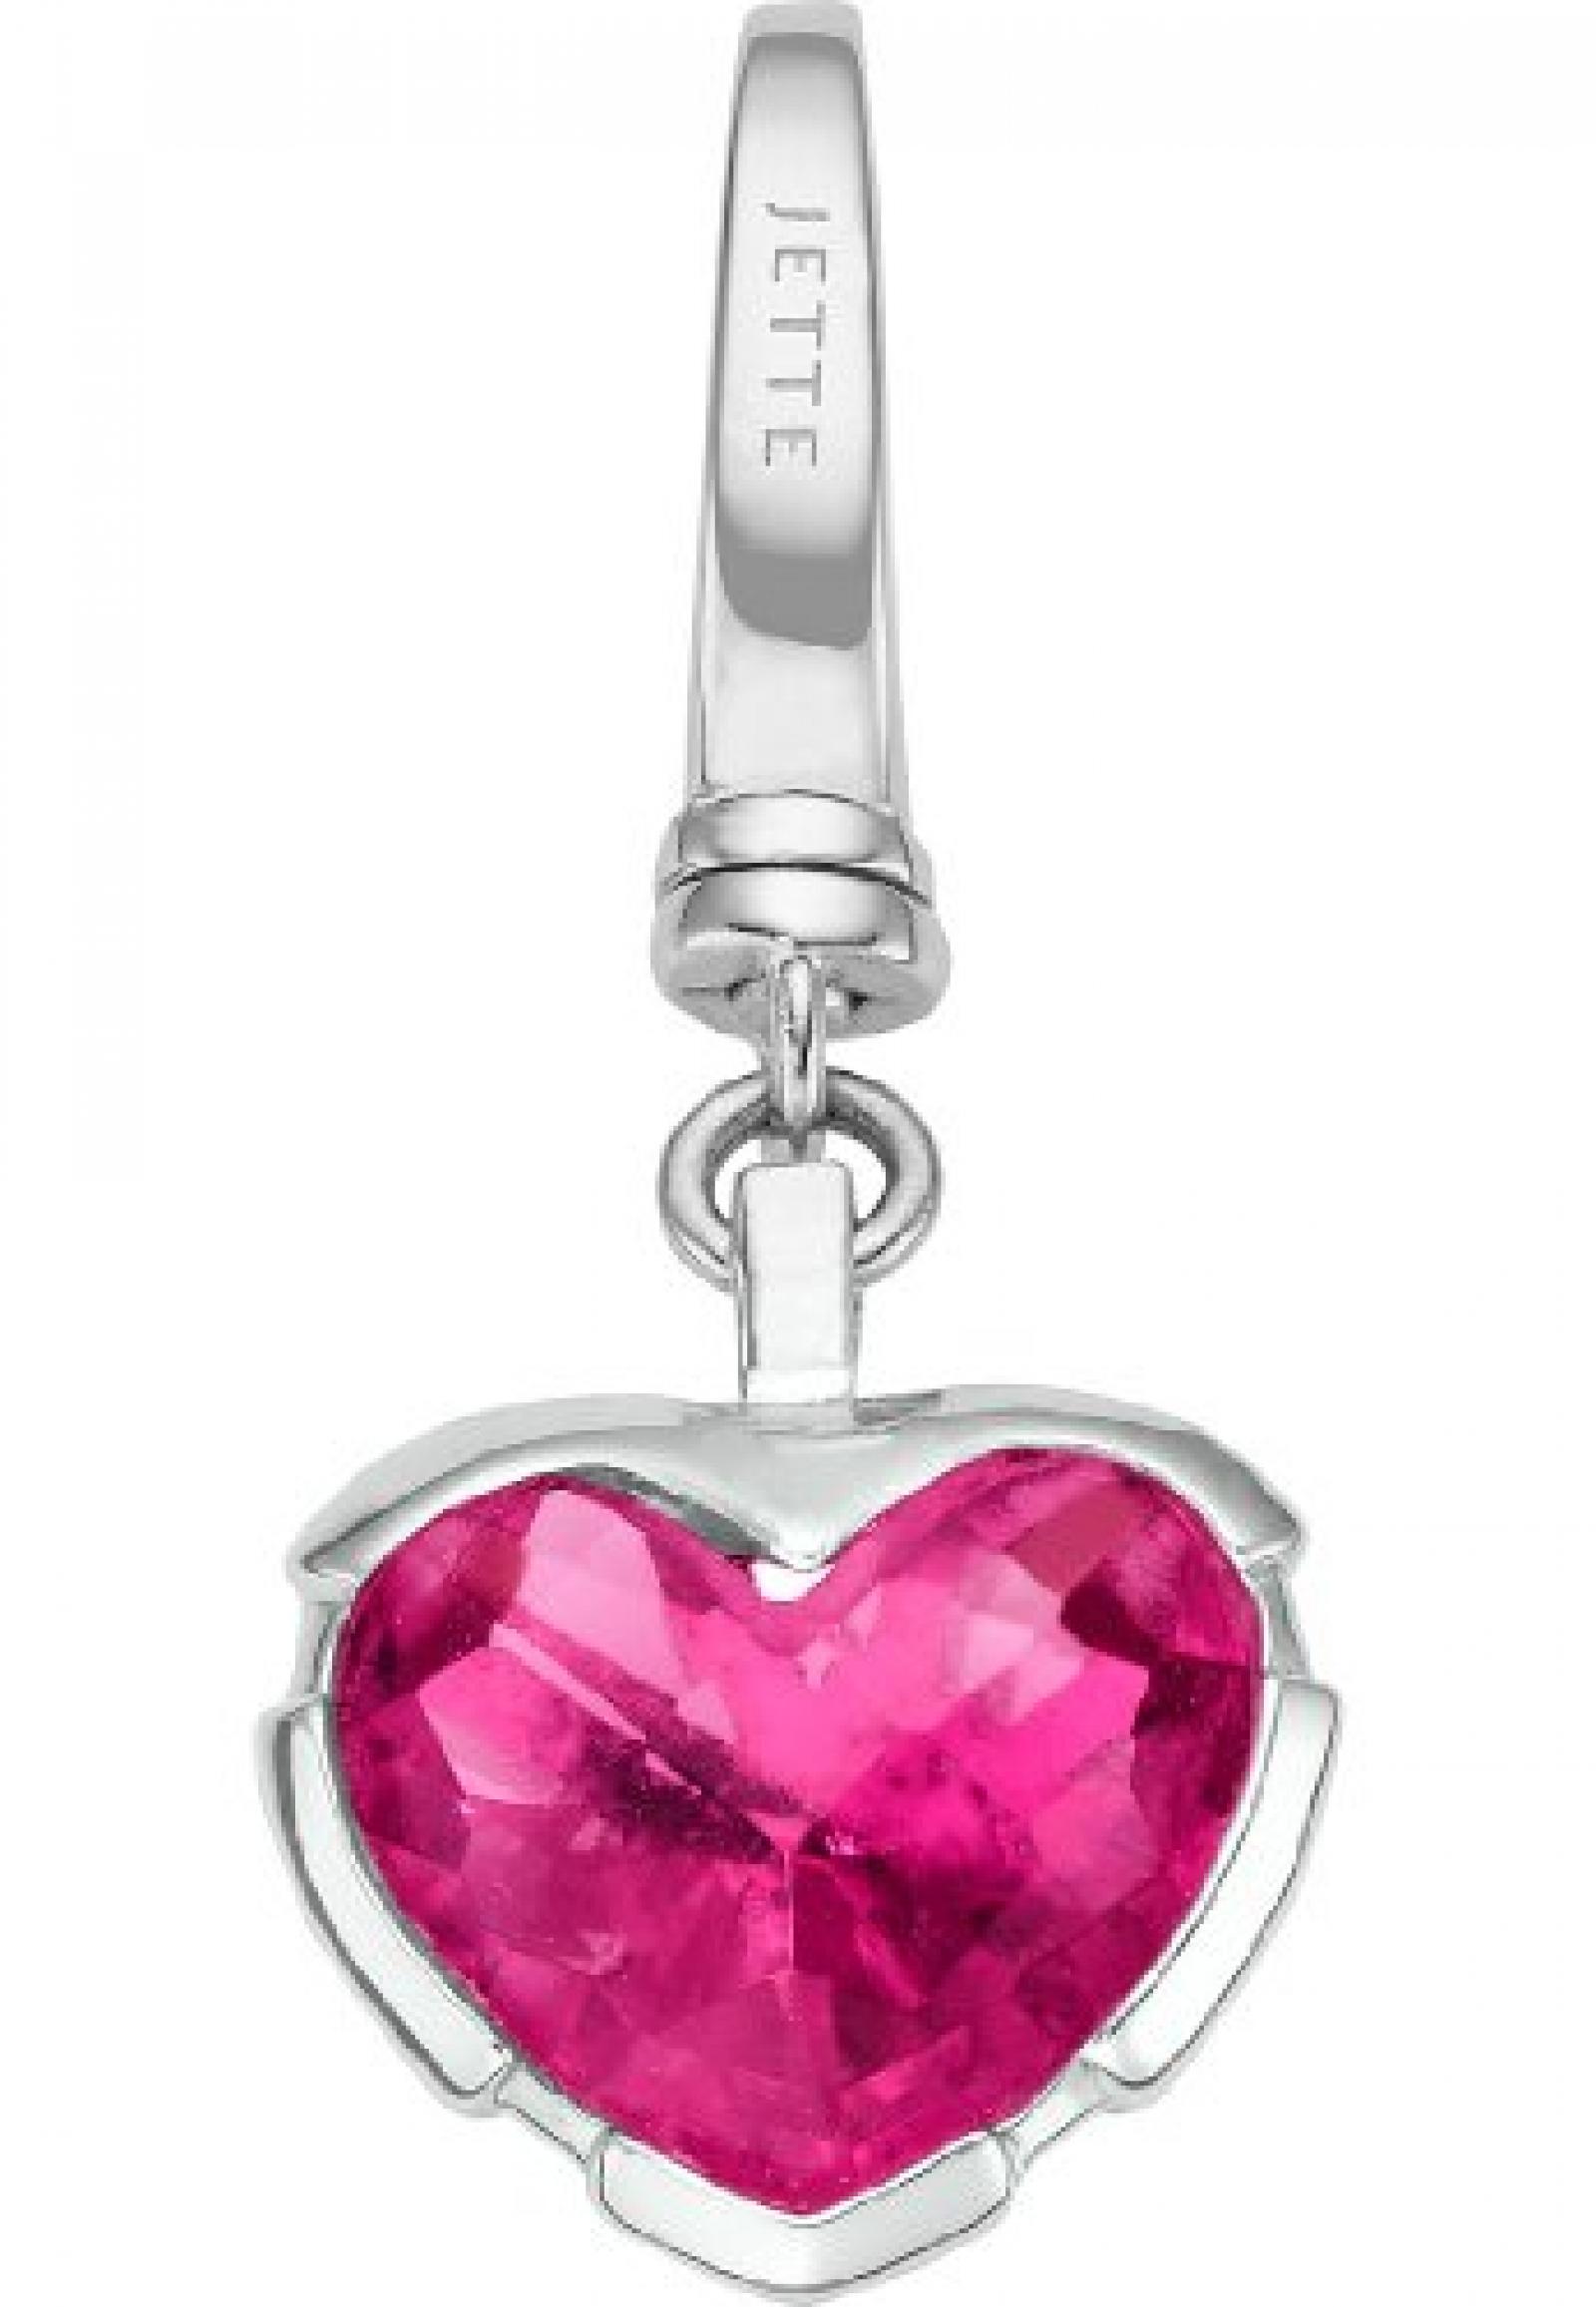 JETTE Charms Damen-Charm CHARM 925er Silber rhodiniert 1 Kristall One Size, fuchsia